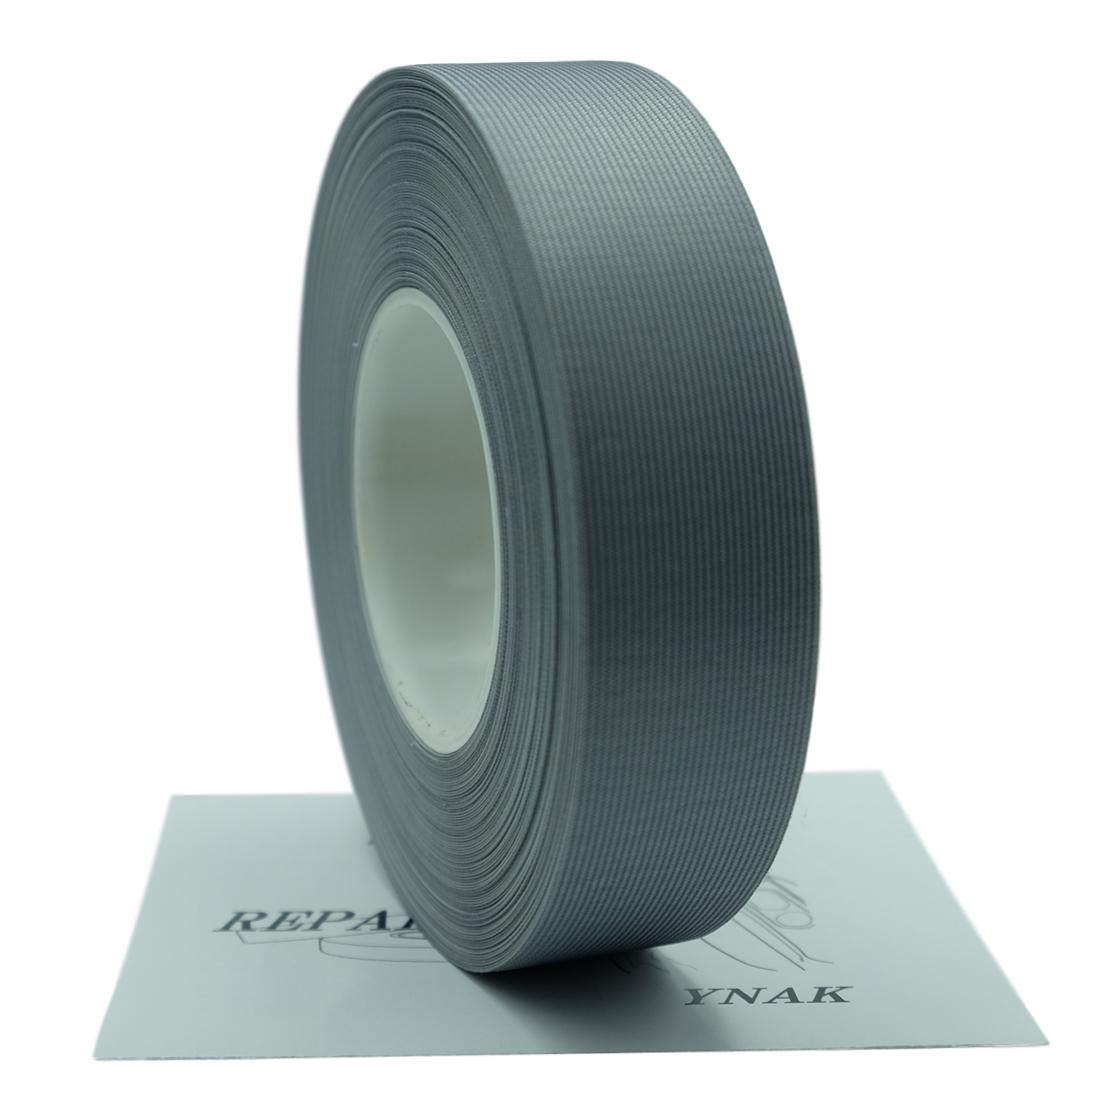 YNAK テント ザック タープ シート レインウェアー 補修 メンテナンス 用 強力 トリコット 表面布状 アイロン式 3レイヤー適合 説明書付き シームテープ (グレー,幅25mm×20m)